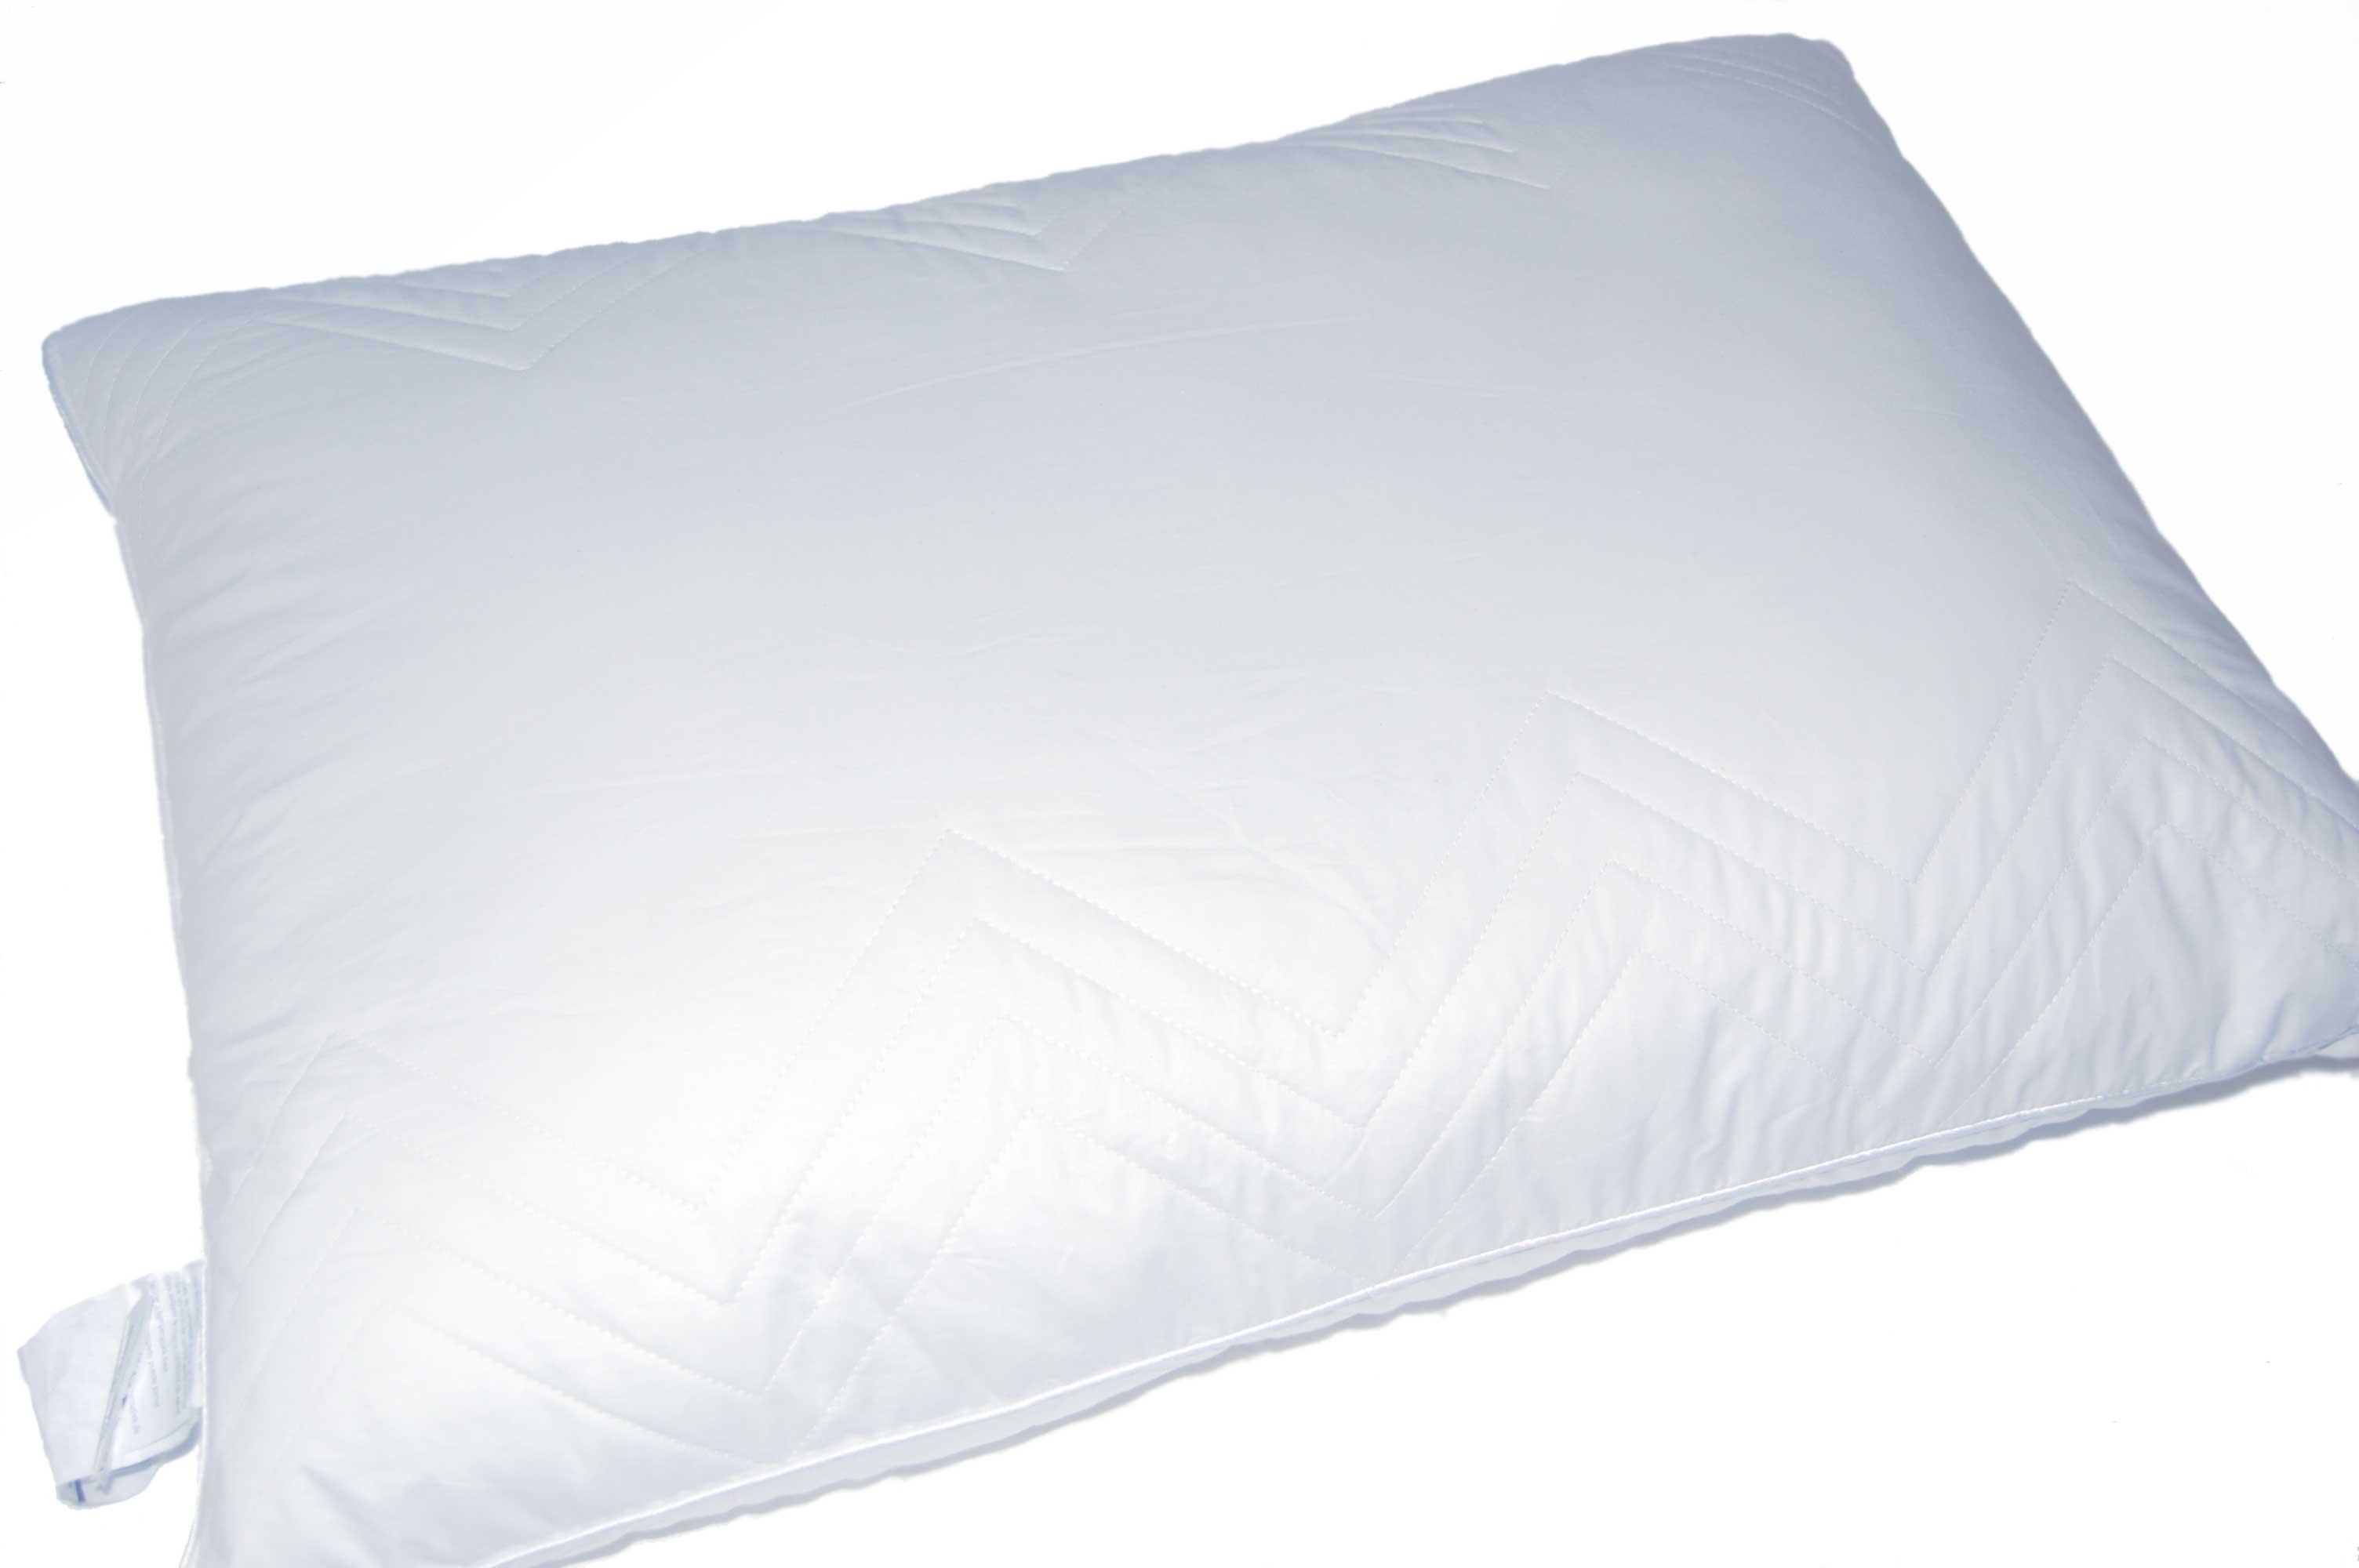 for pillows the hunt pillow massageworkslg feather perfect